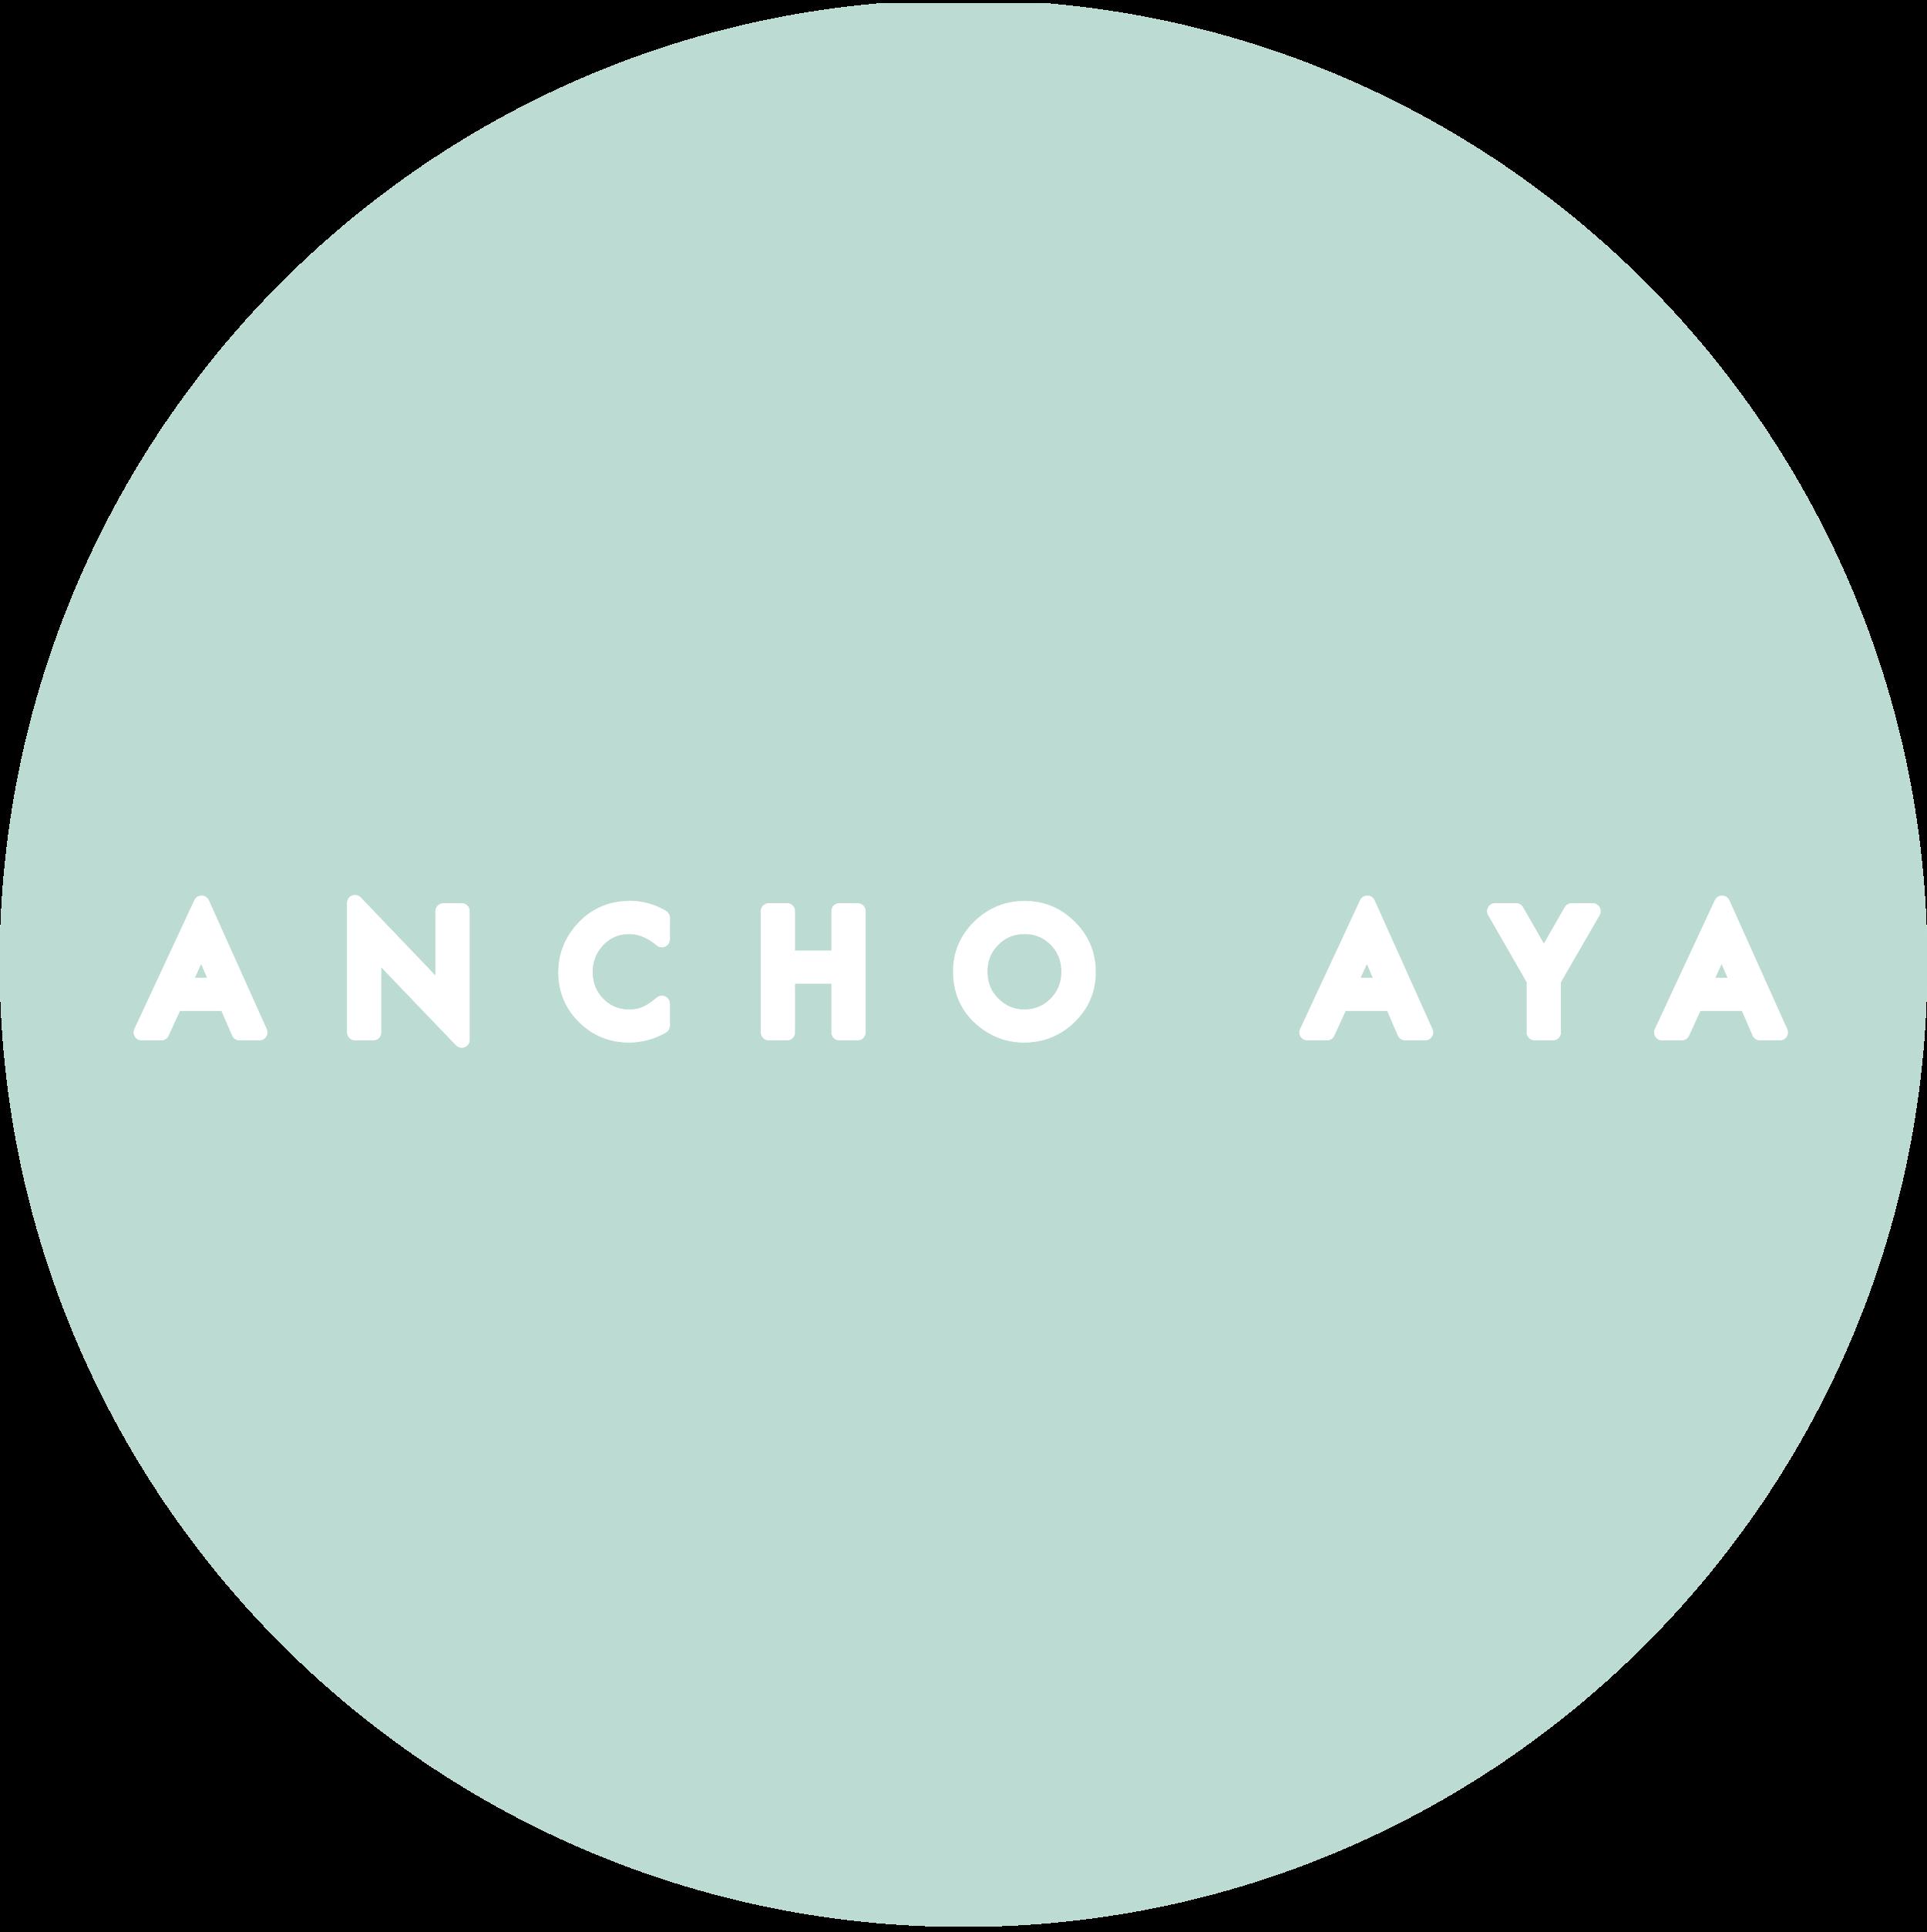 ANCHO AYA(アンチョアヤ)オンラインショップ